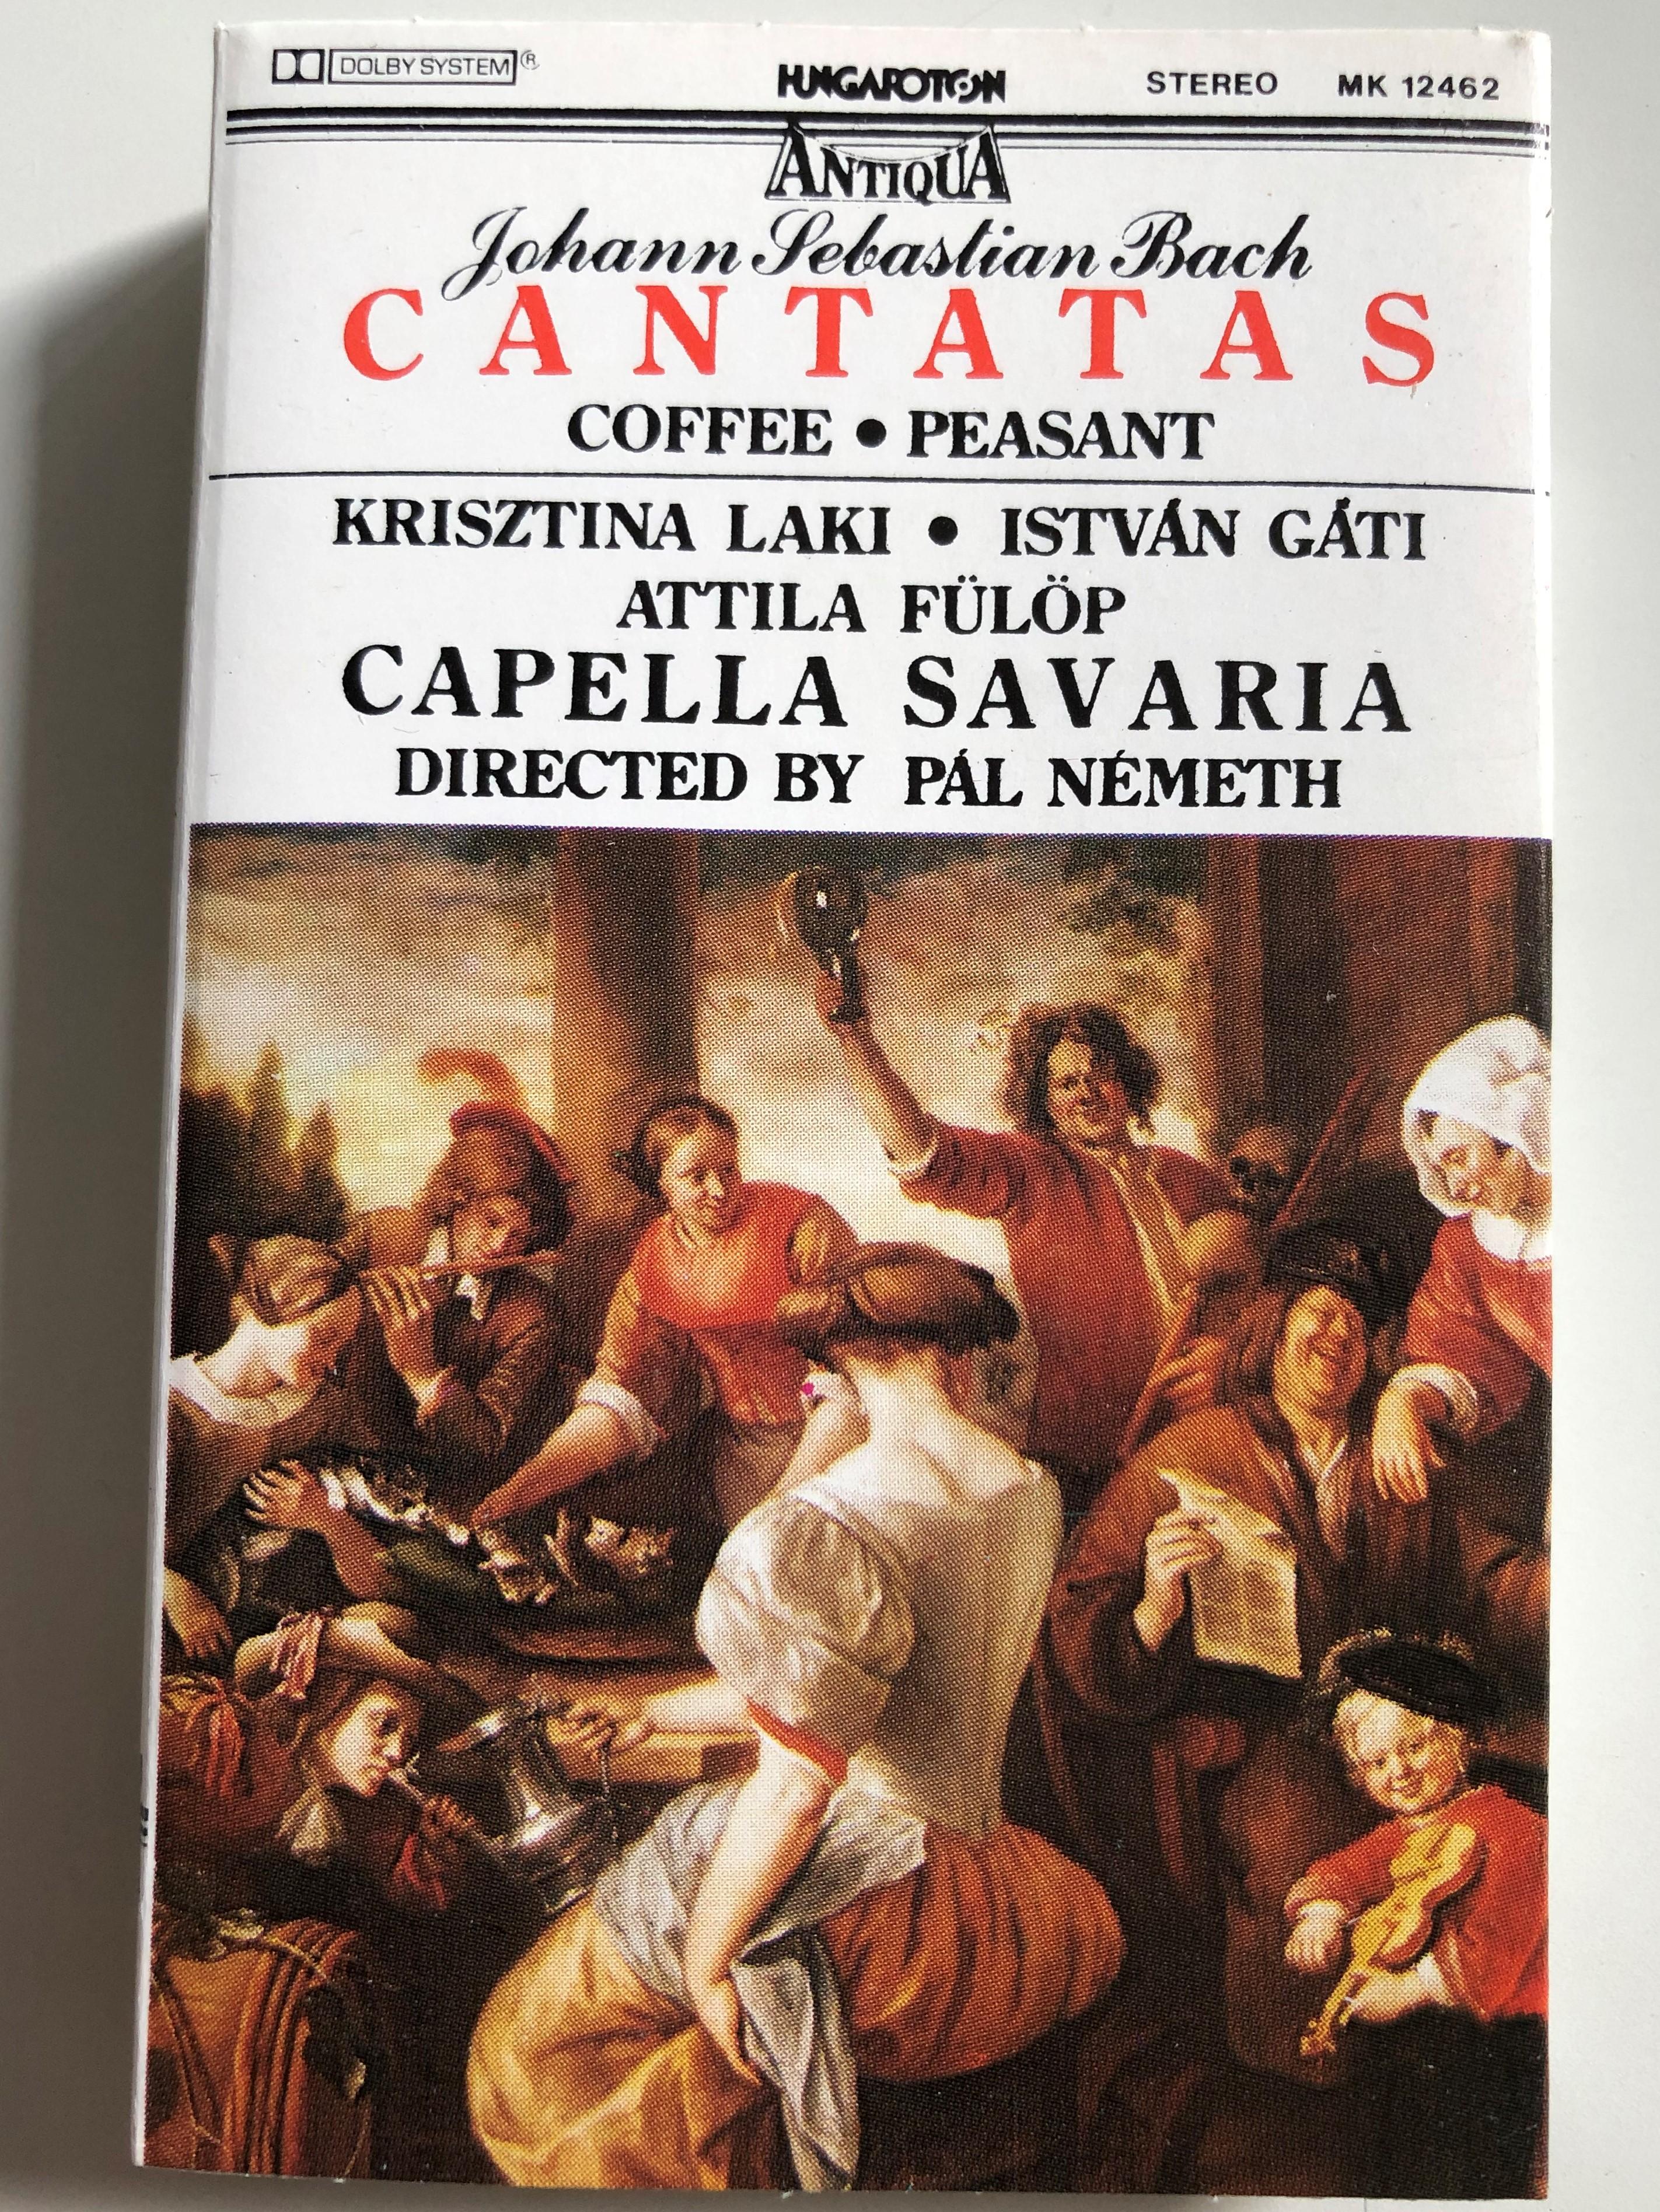 johann-sebastian-bach-cantatas-coffe-peasant-krisztina-laki-istv-n-g-ti-attila-f-l-p-directed-p-l-n-meth-capella-savaria-hungaroton-cassette-stereo-mk-12462-1-.jpg